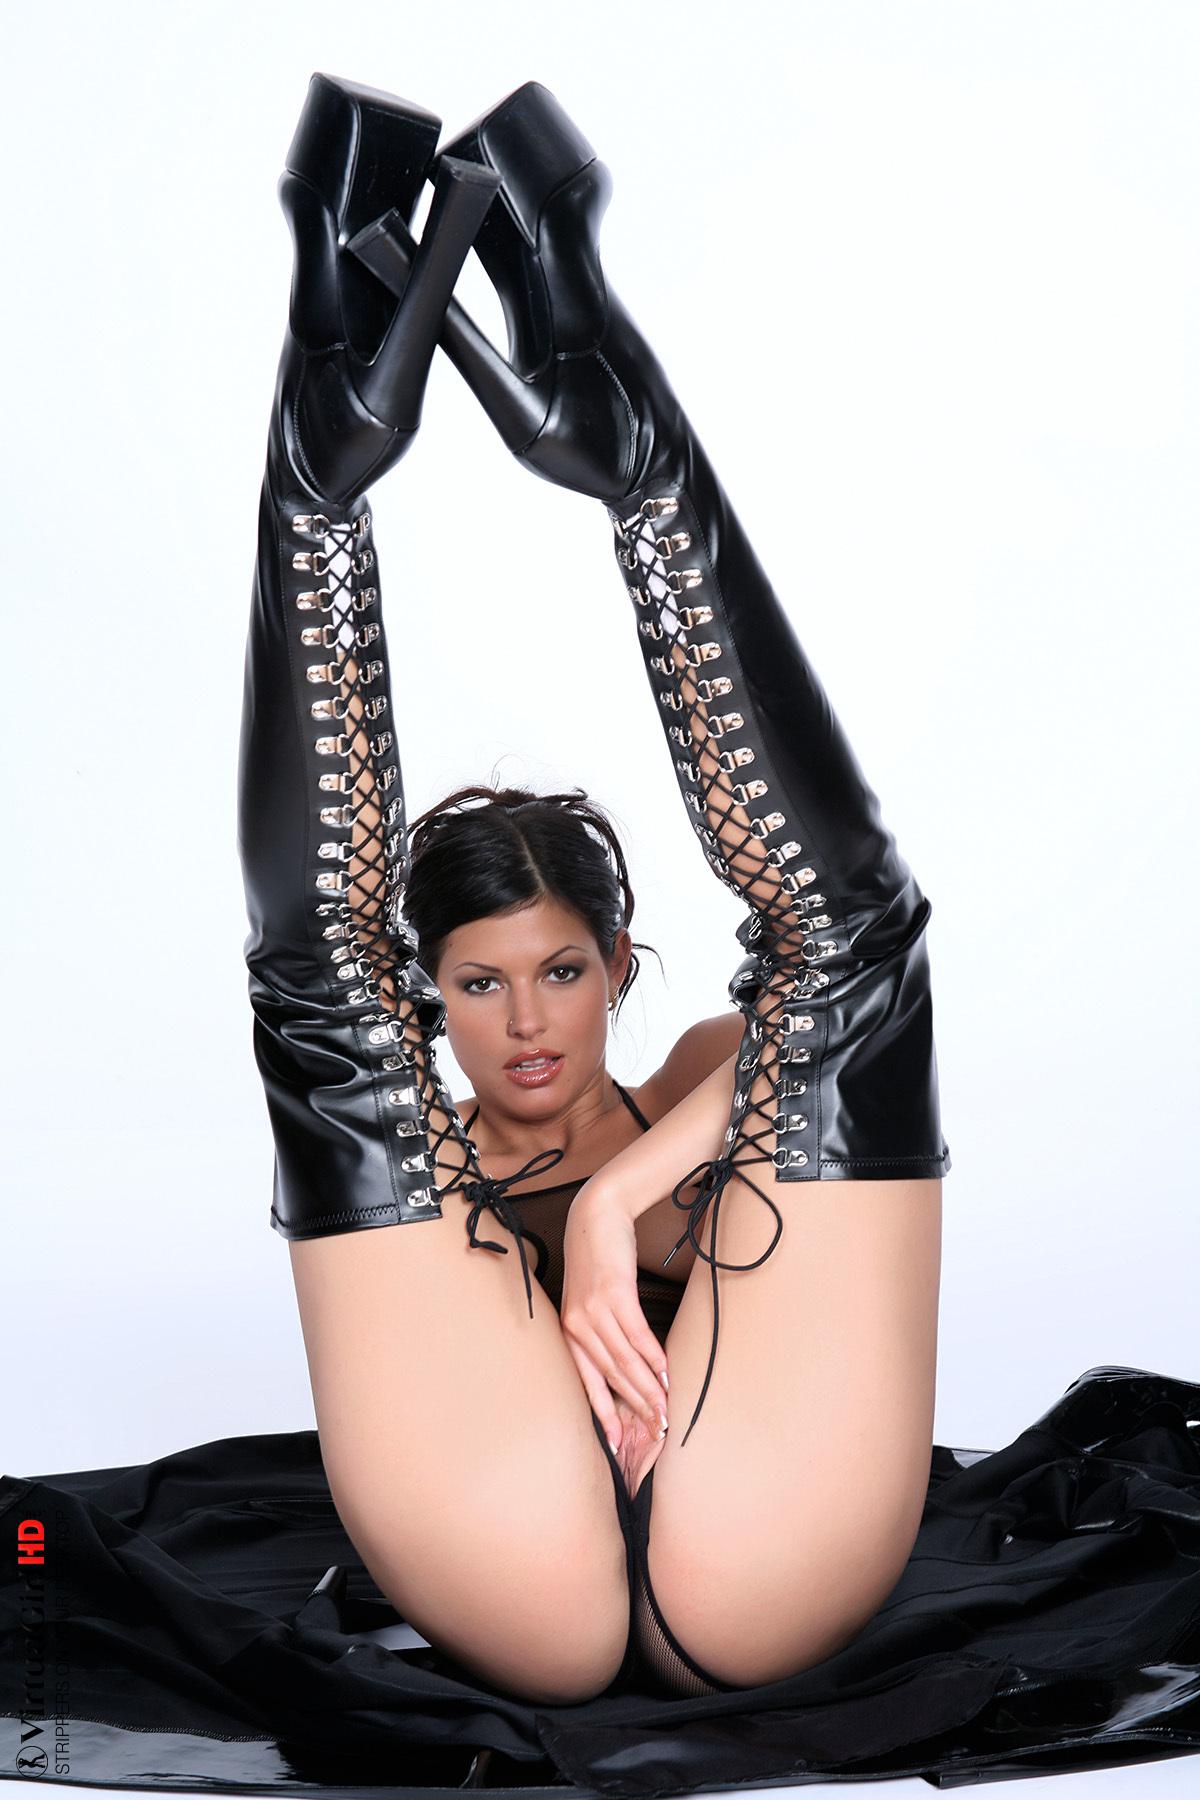 girls stripping down